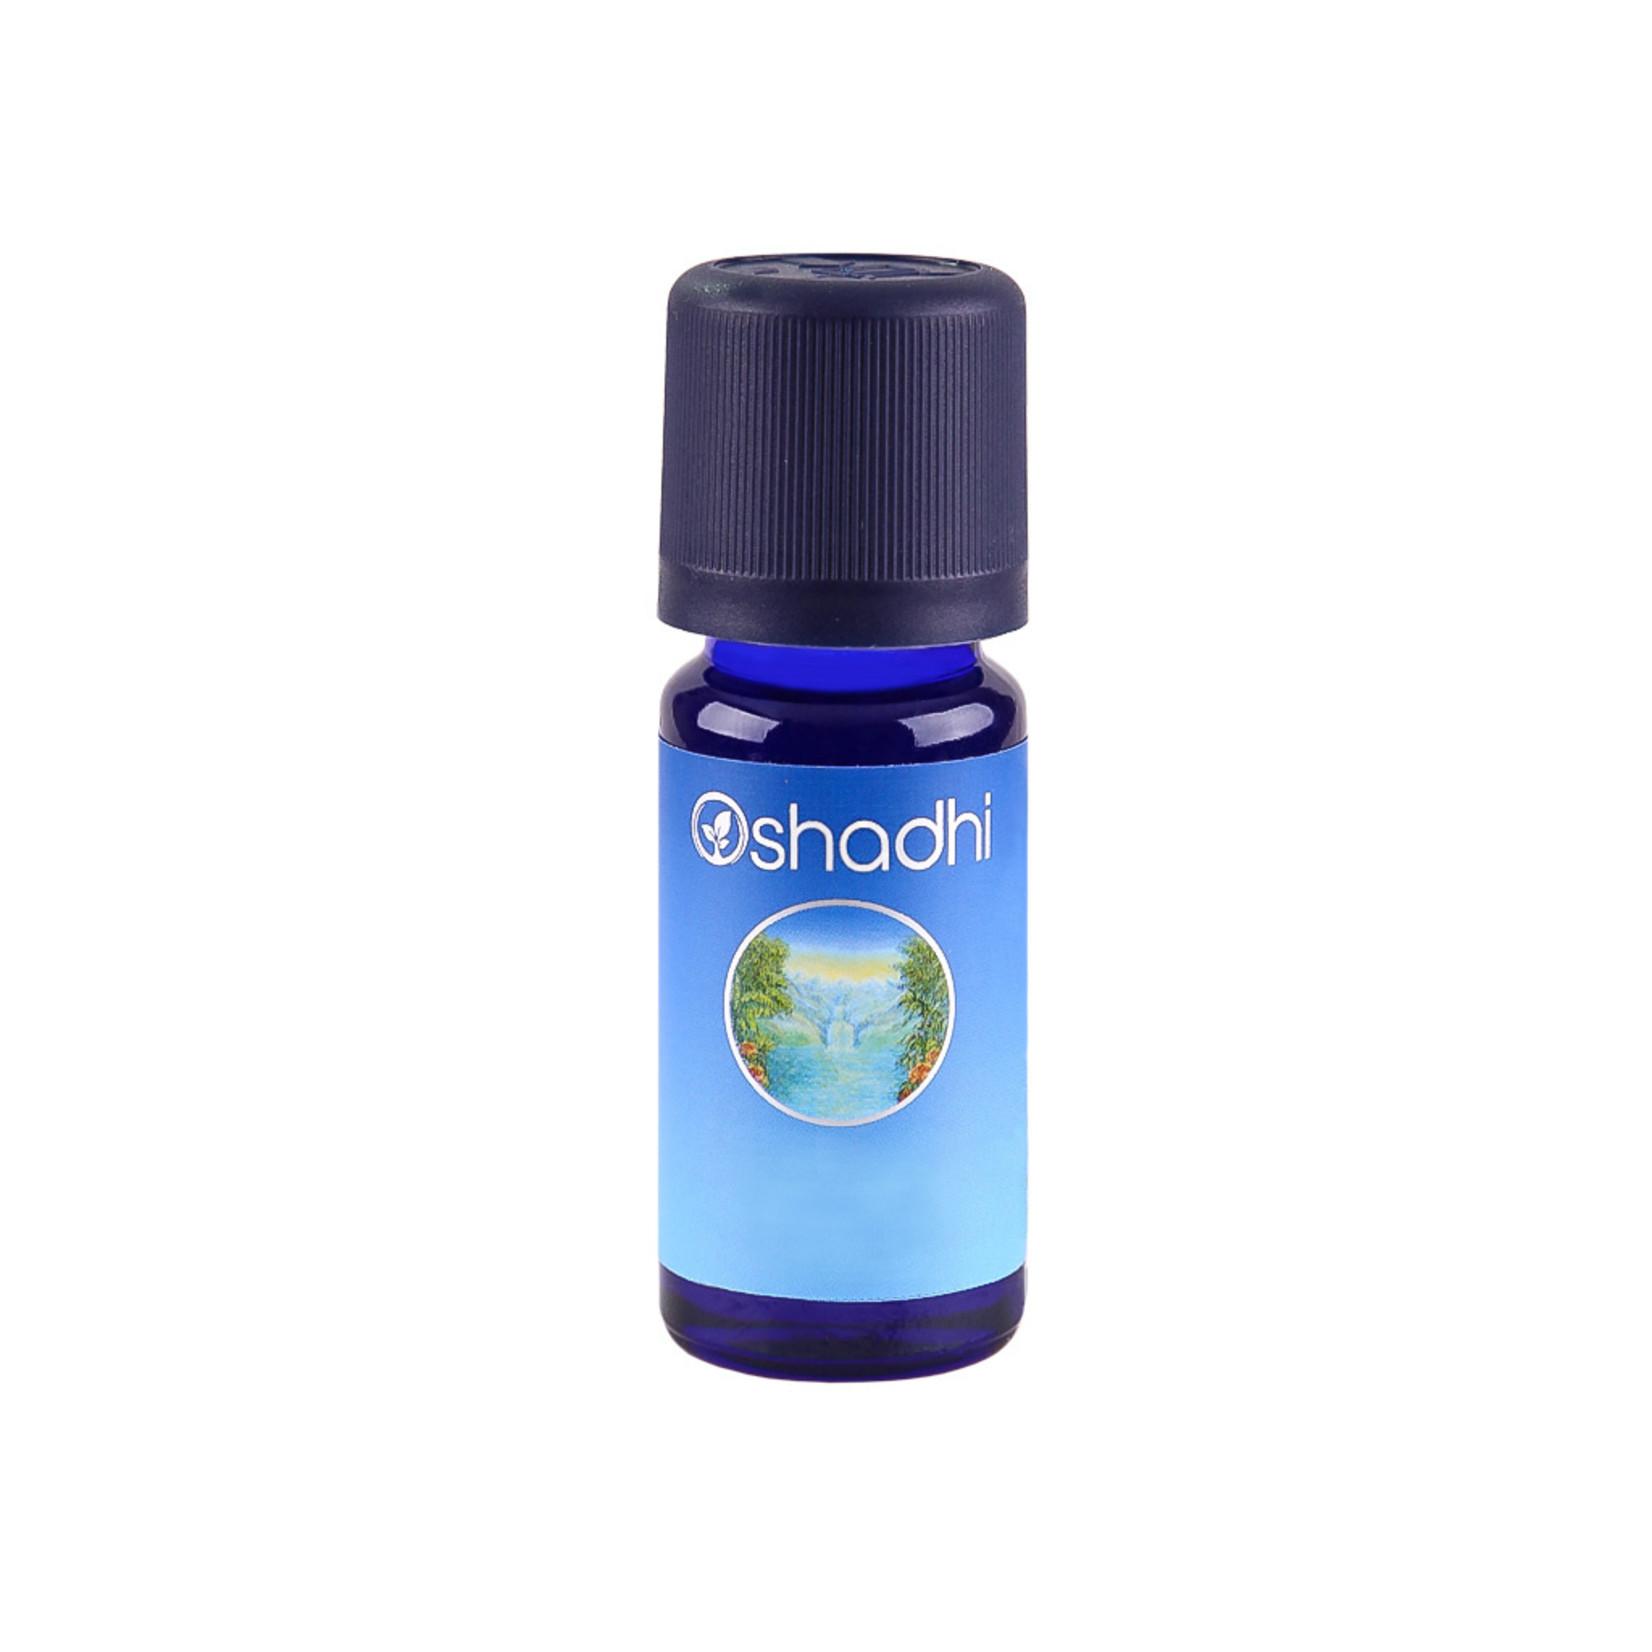 Oshadhi Rode mandarijn Oshadhi - lievelingsolie van kinderen - 10ml